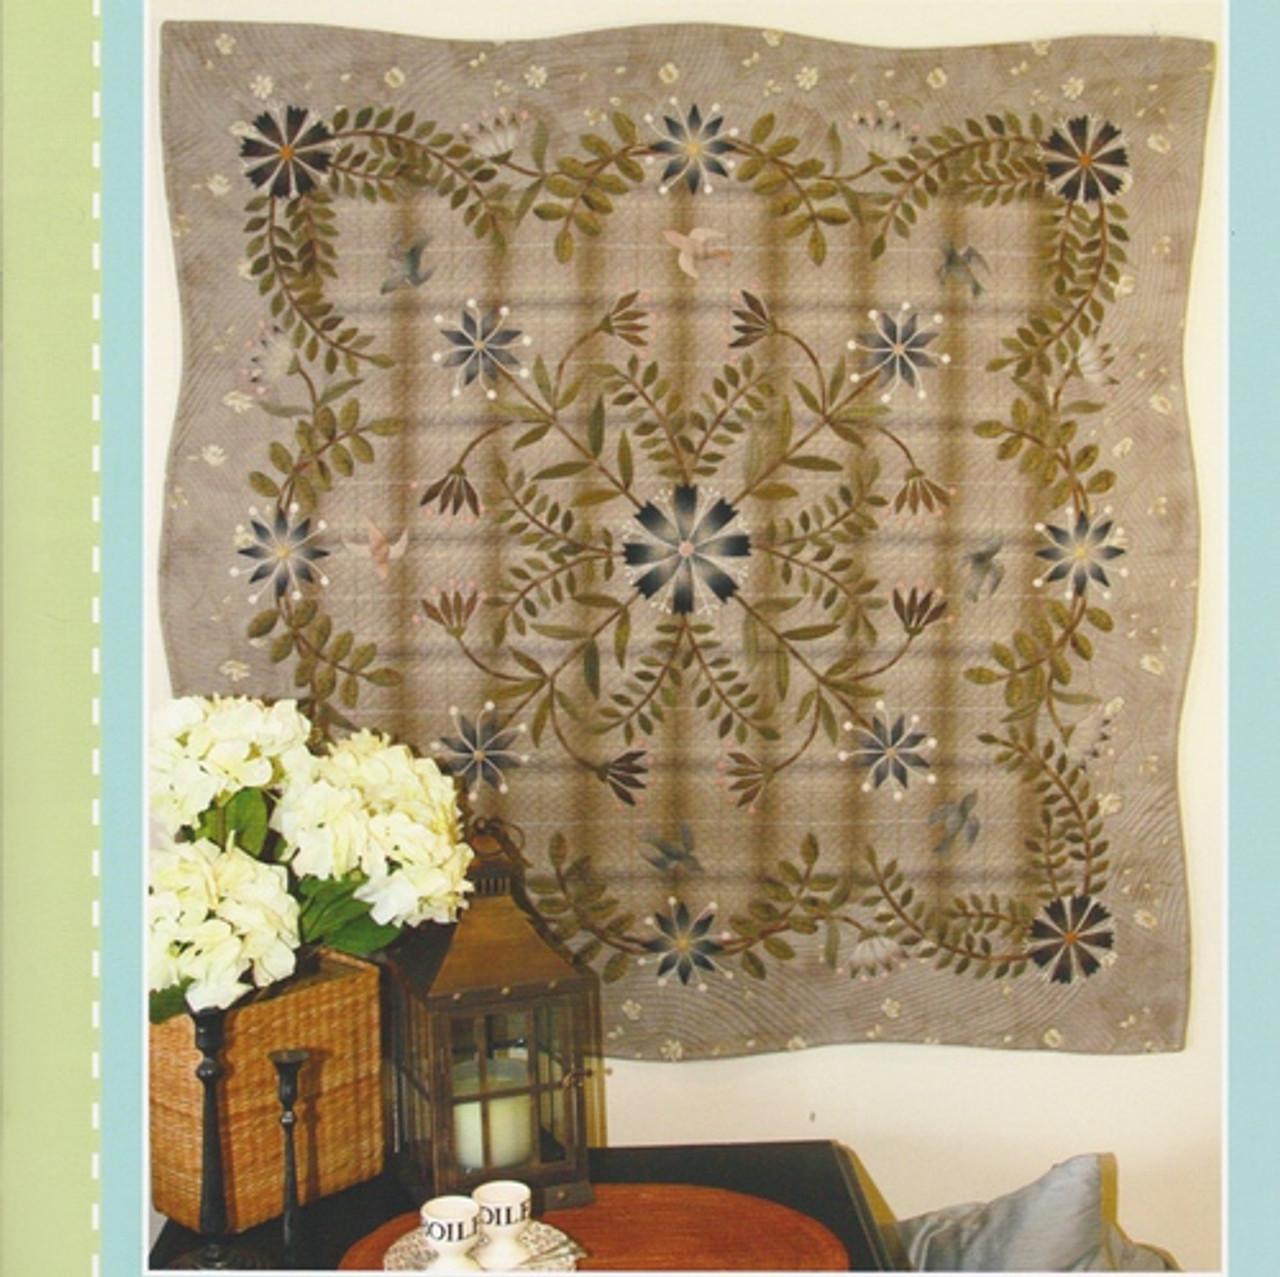 Floral Wonder Quilt Pattern Pys-974689 - Bebe Bold Japanese Textiles  Craft-6862